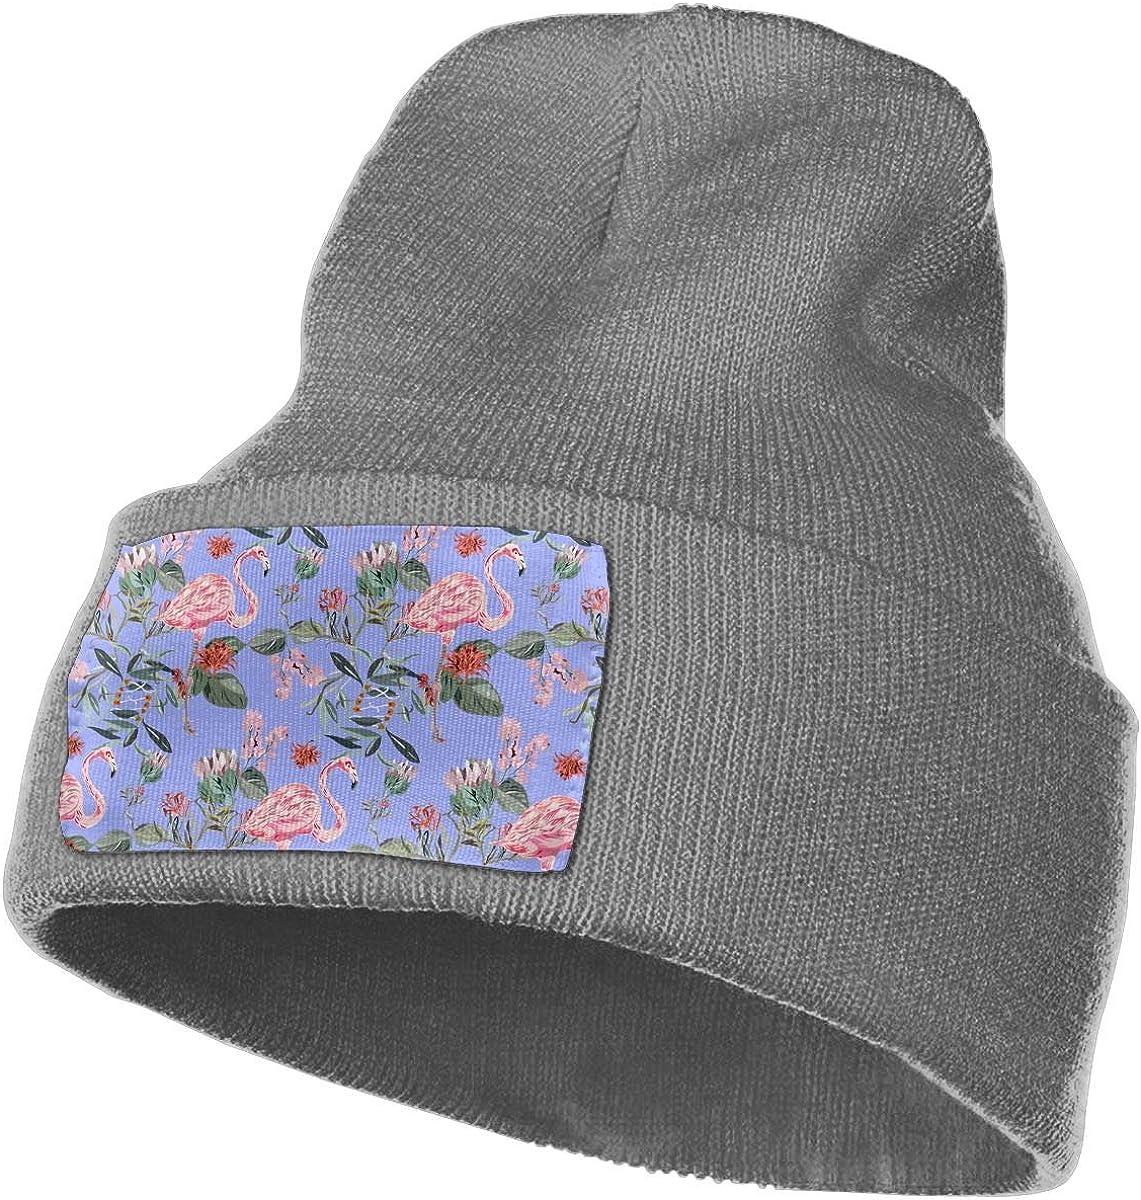 QZqDQ Flowers Unisex Fashion Knitted Hat Luxury Hip-Hop Cap